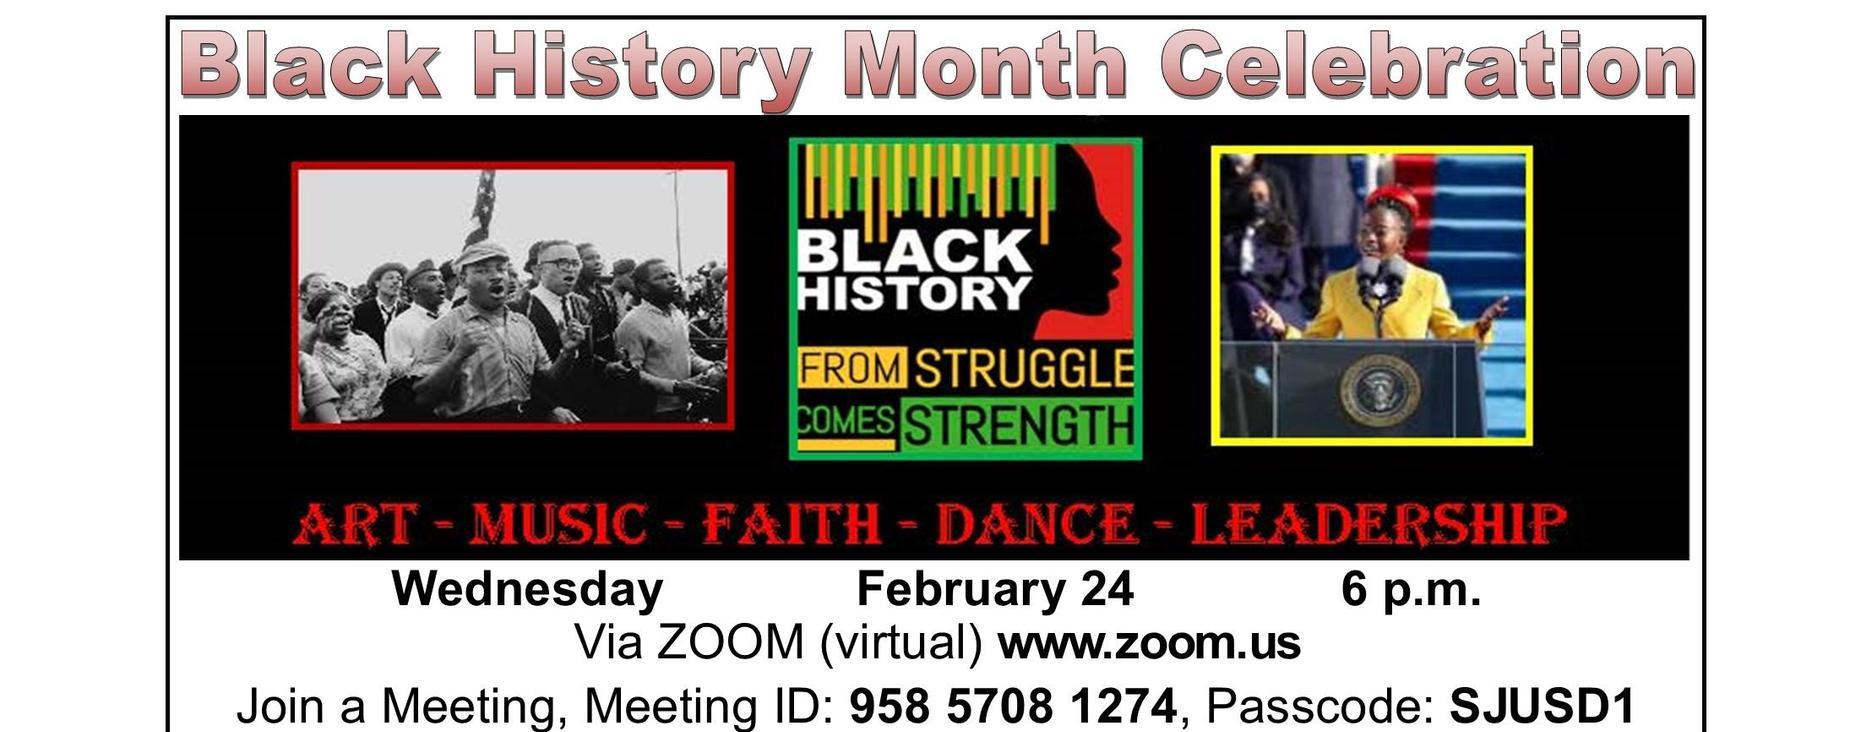 Black History Month Celebration, Wed., Feb. 24, 6pm, Zoom.com, Meeting ID 958 5708 1274, Passcode SJUSD1